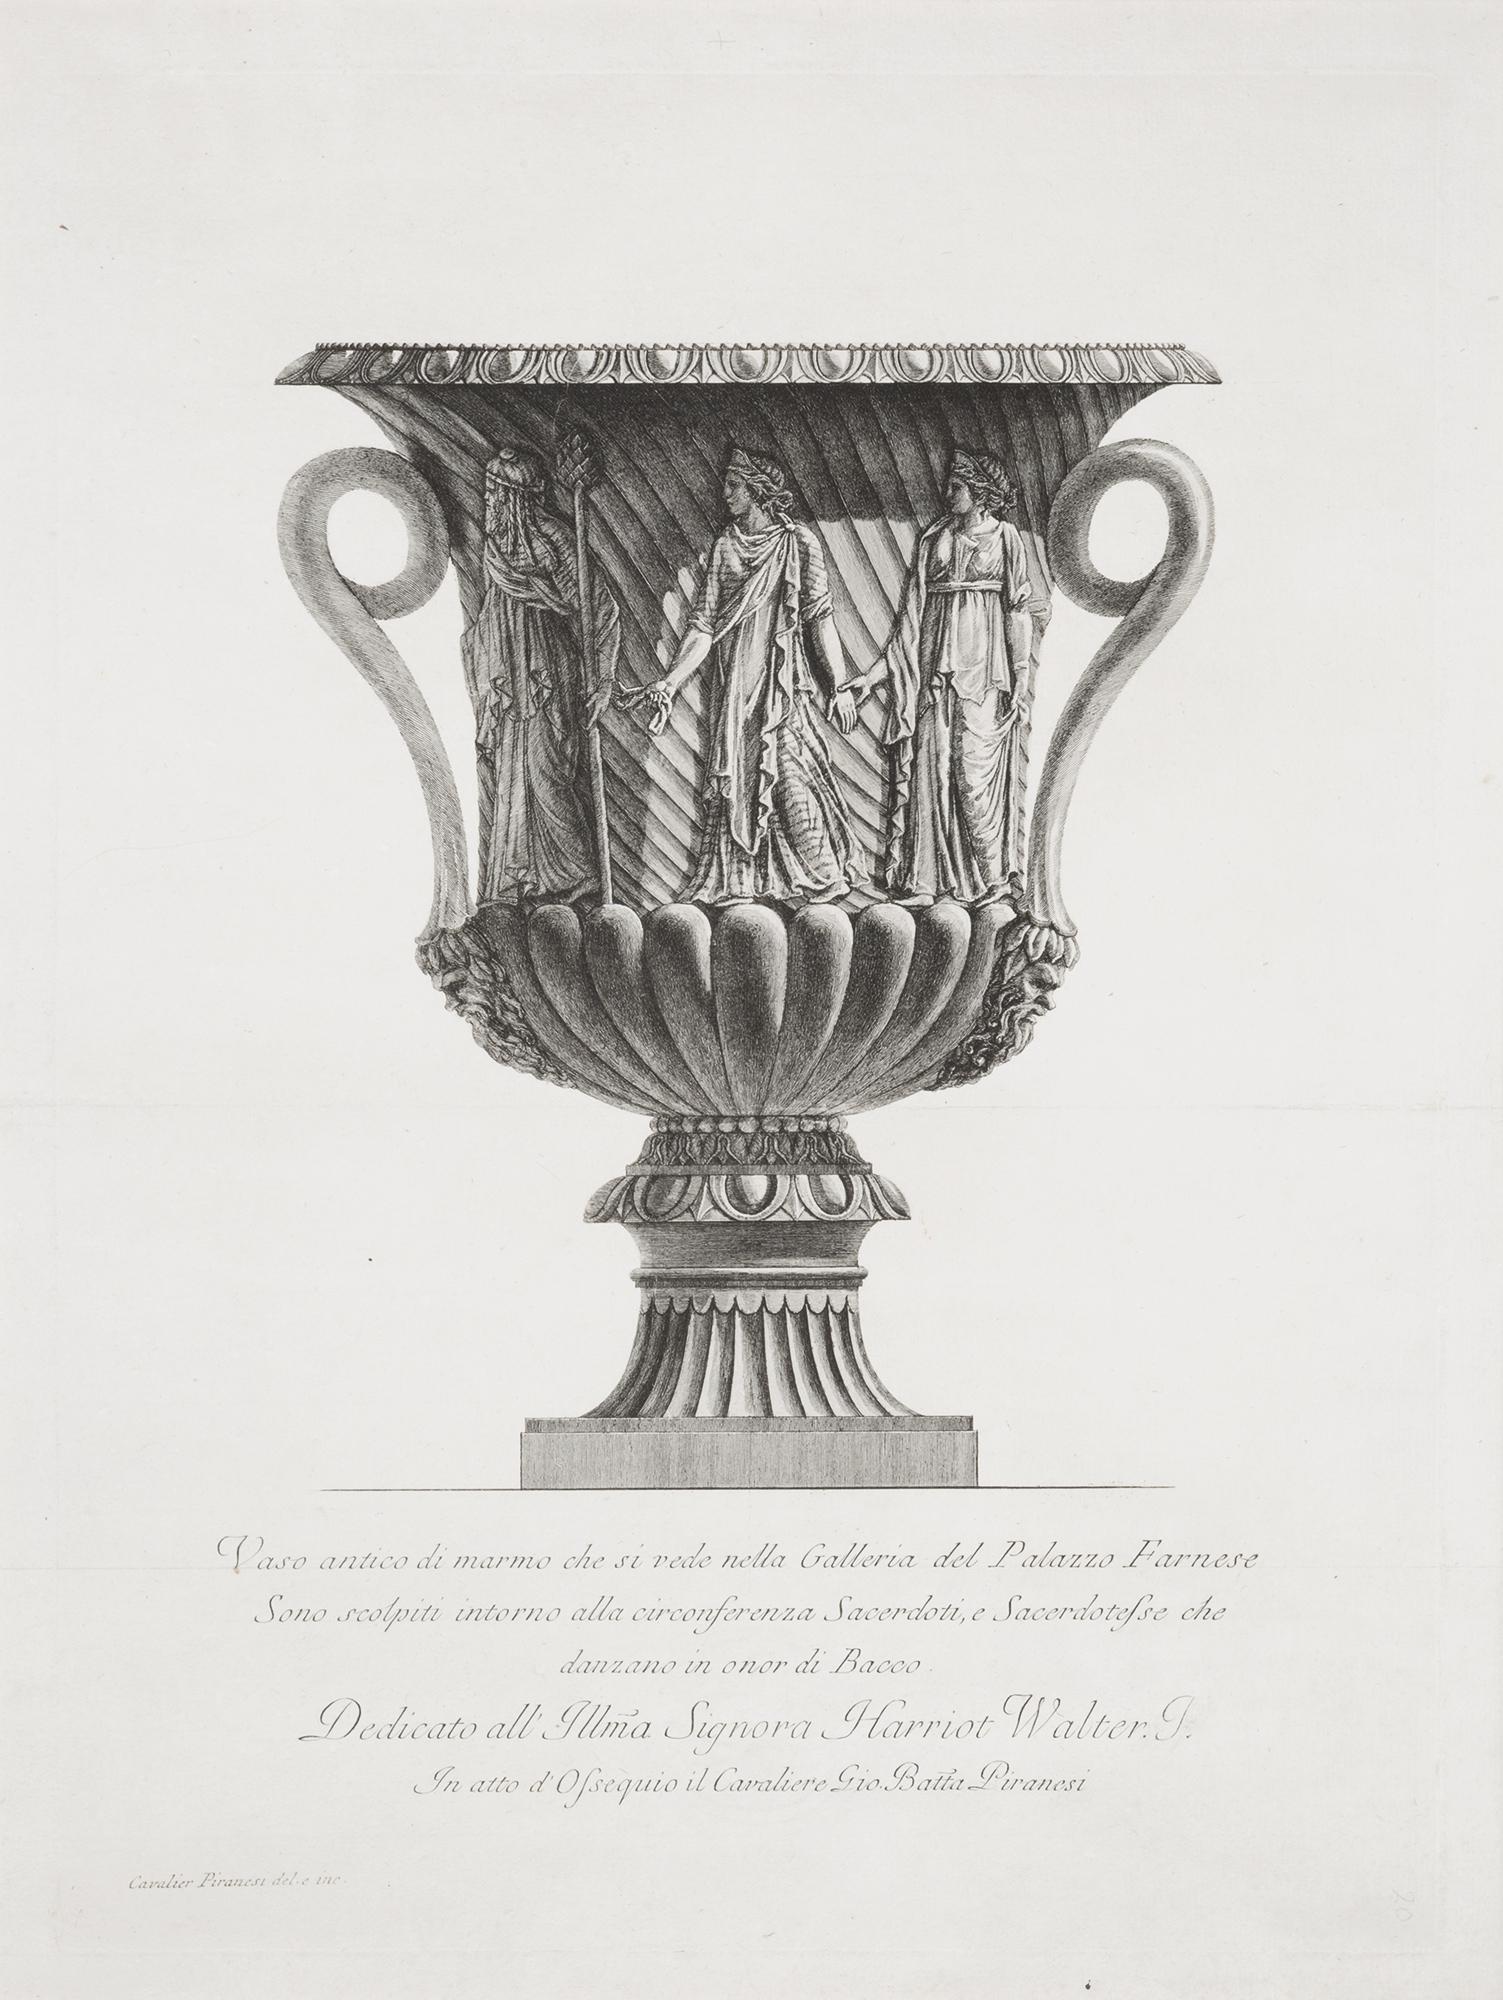 Piranesi vasi antichi di marmo eccellentemente scolpiti for Vasi antichi